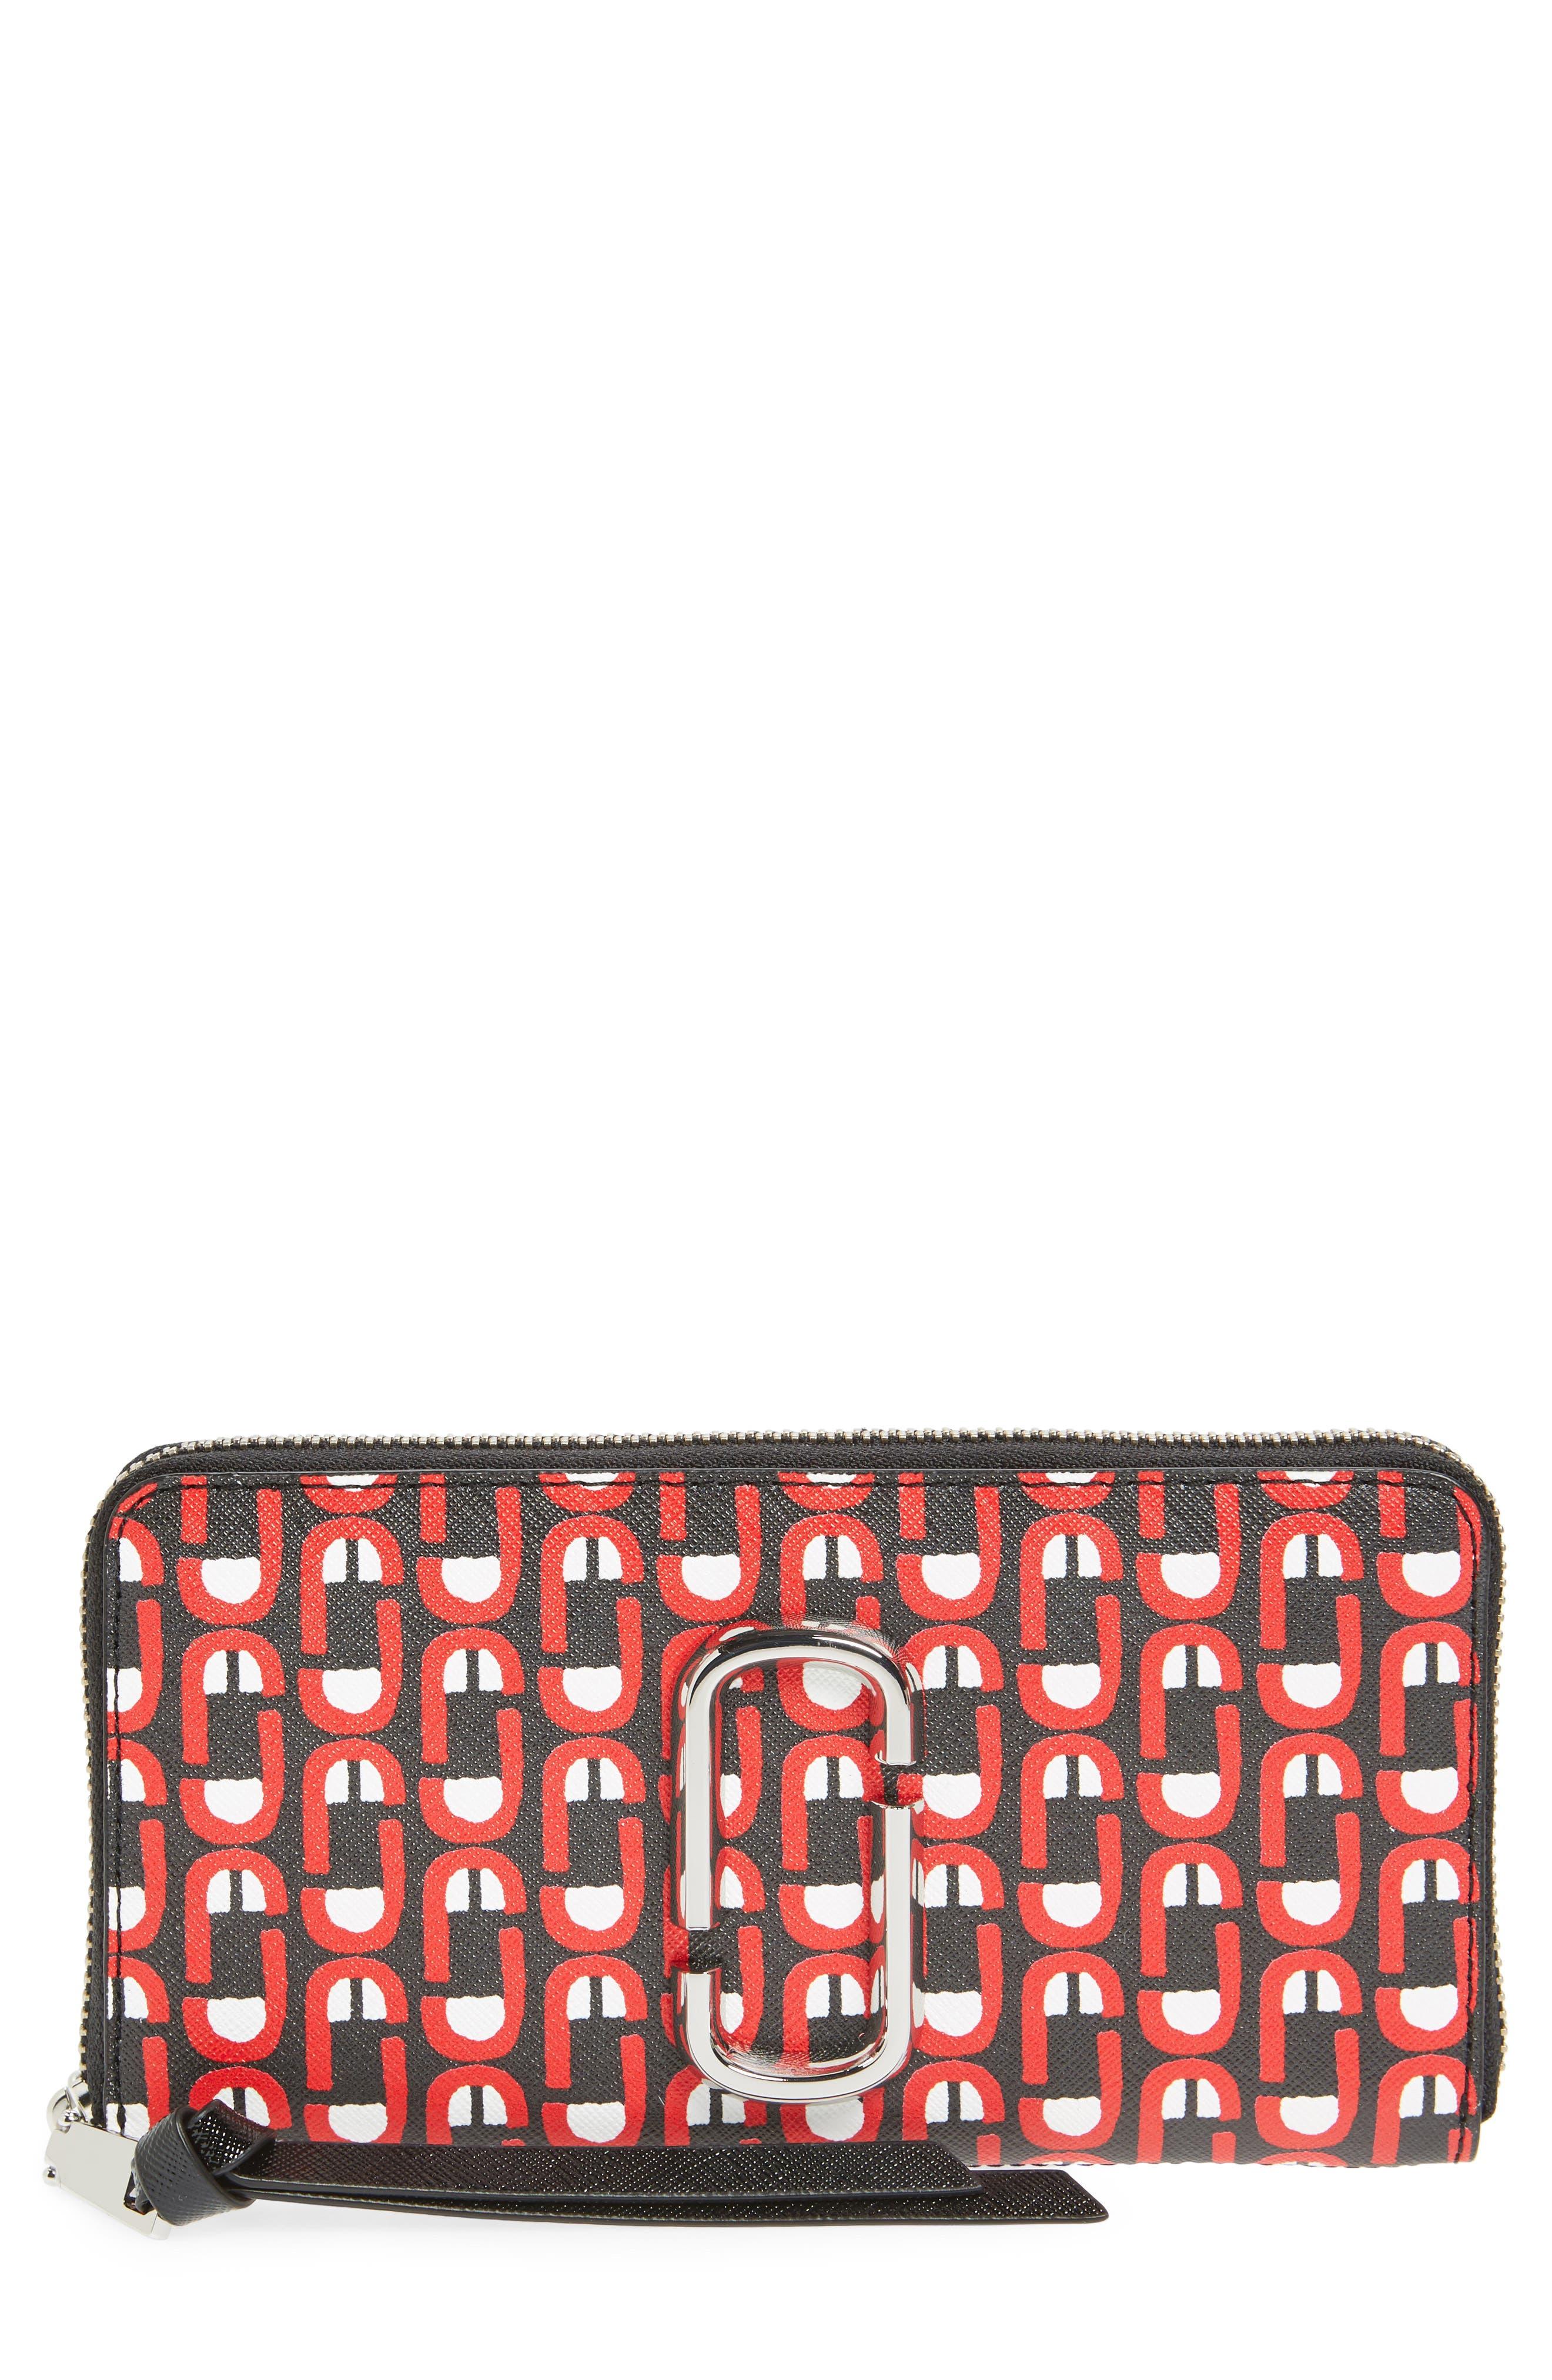 Snapshot Scream Zip Wallet,                             Main thumbnail 1, color,                             Red Multi